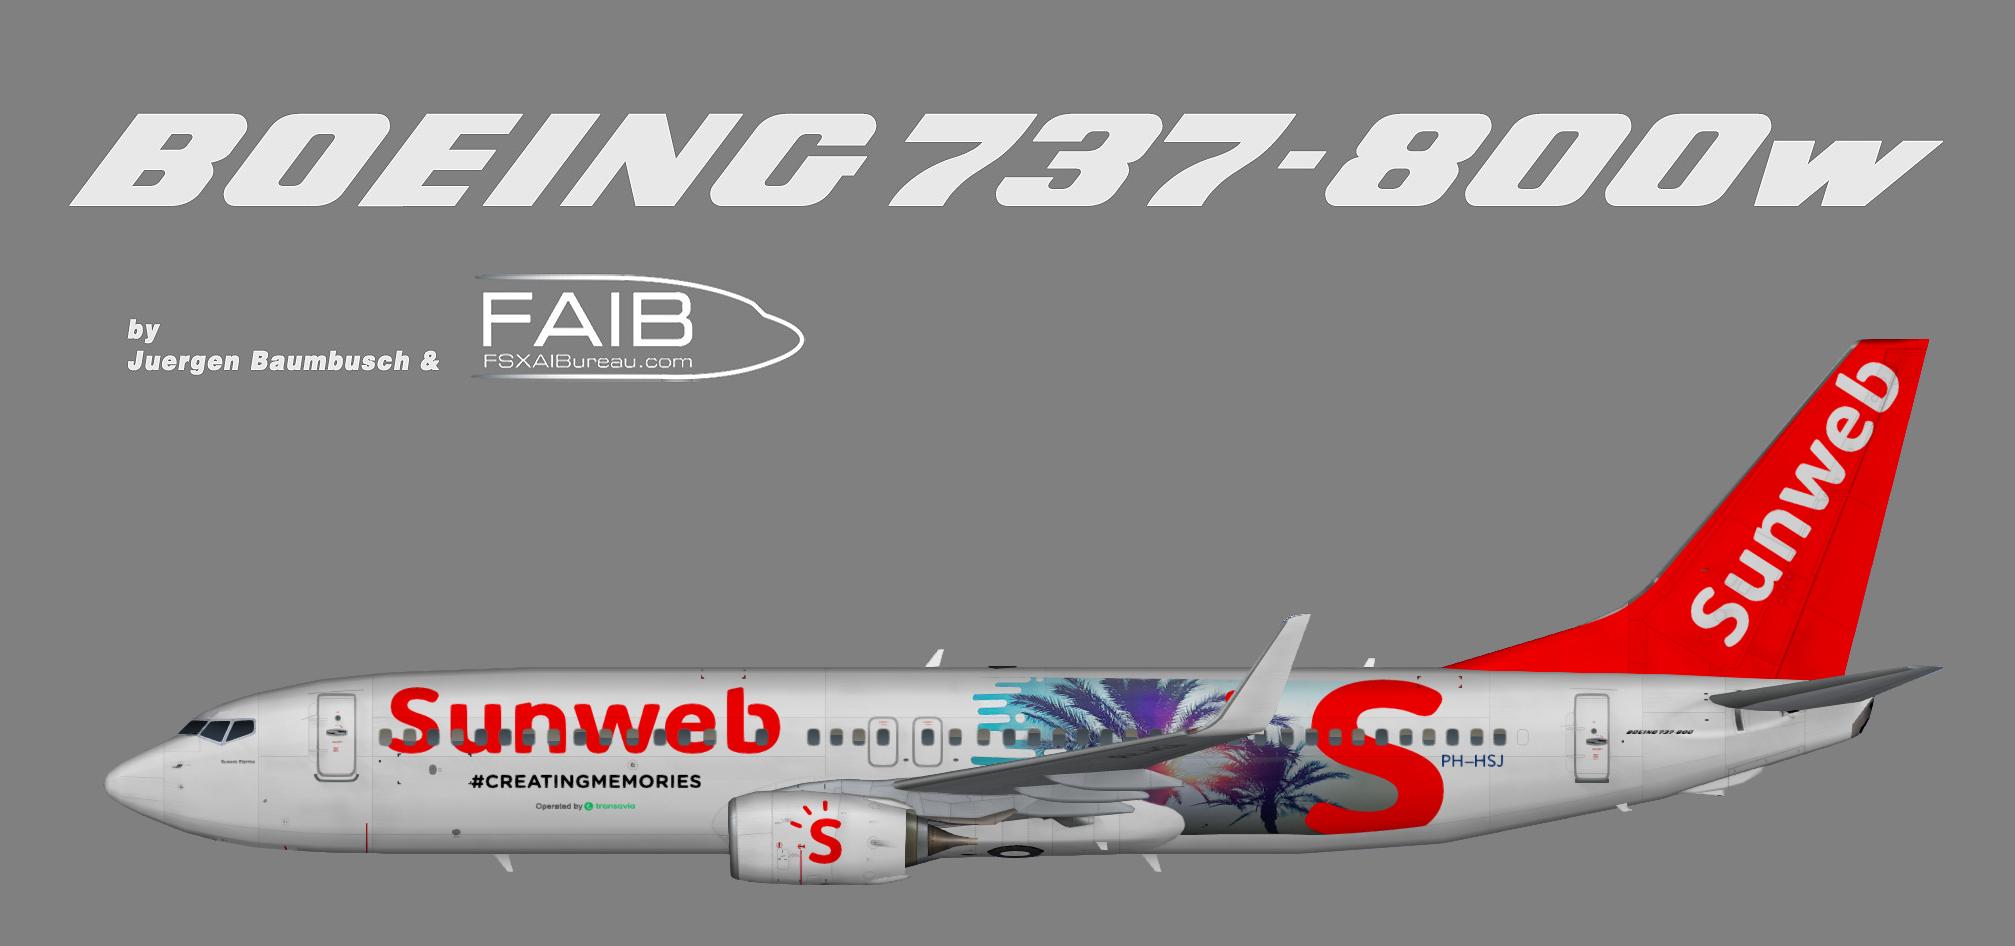 Transavia Boeing 737-800w Sunweb